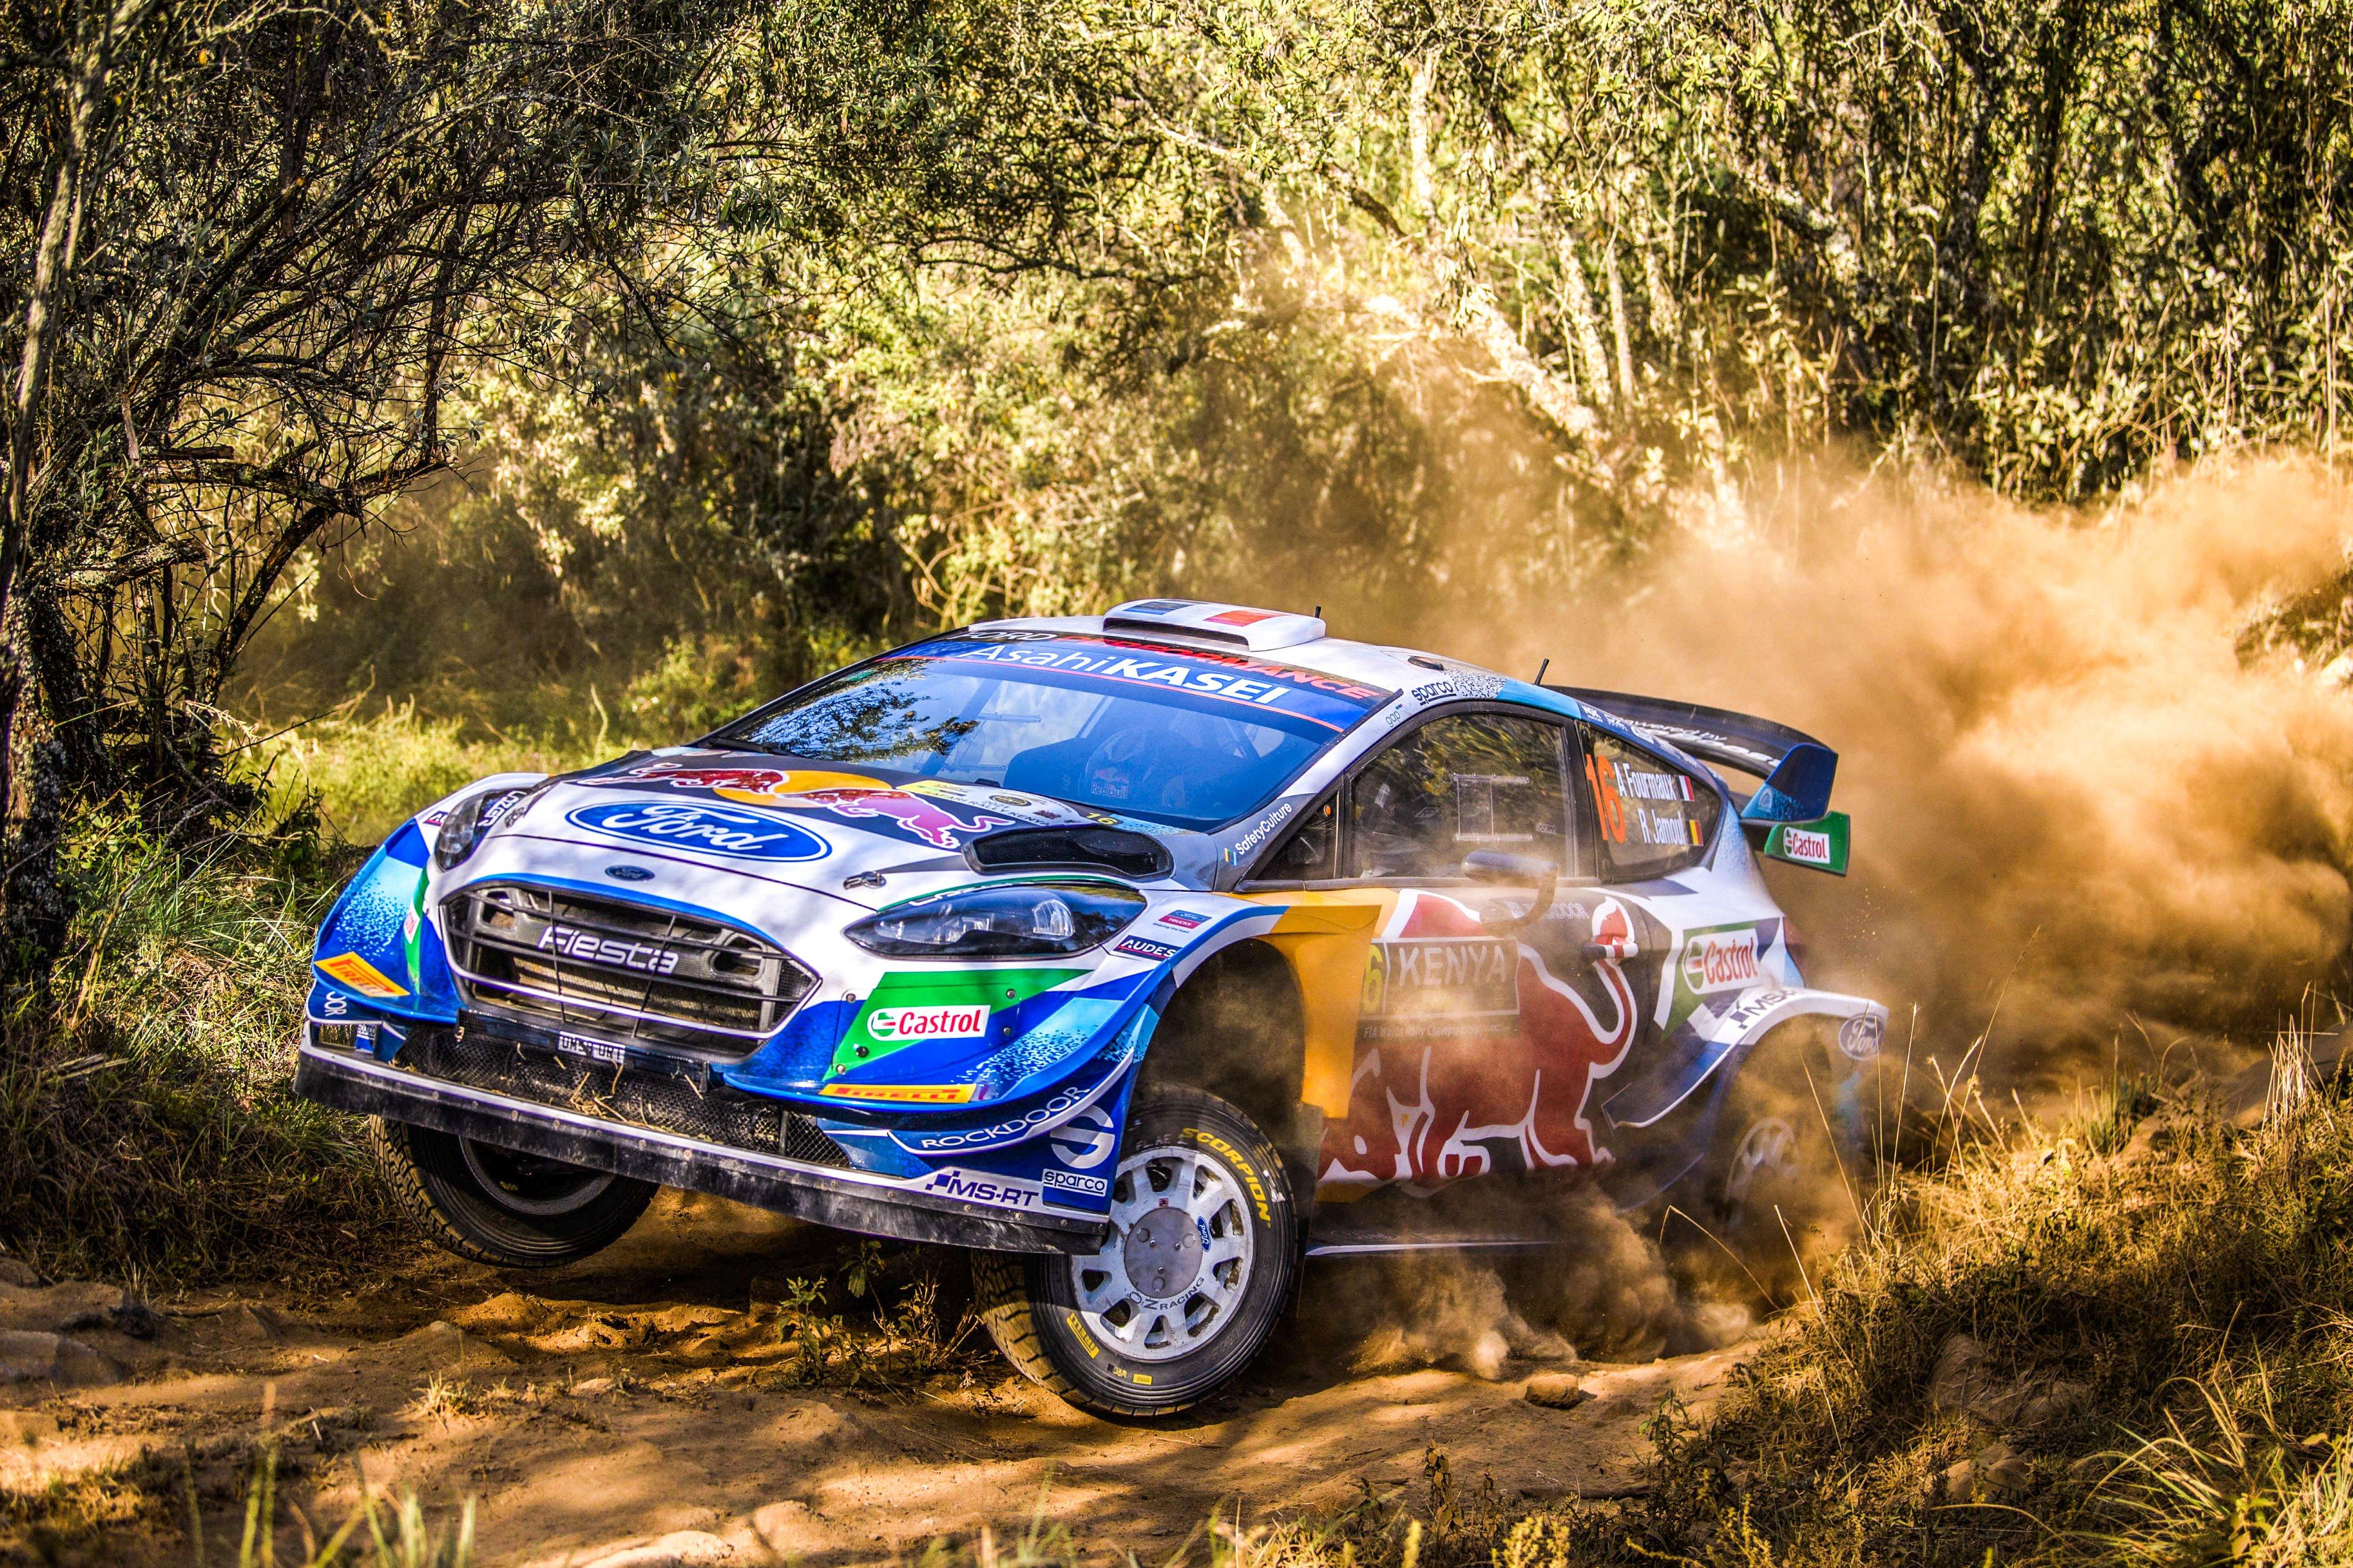 WRC: Safari Rally Kenya [23-27 Junio] - Página 4 E4u9DnaXMAMzlXr?format=jpg&name=4096x4096